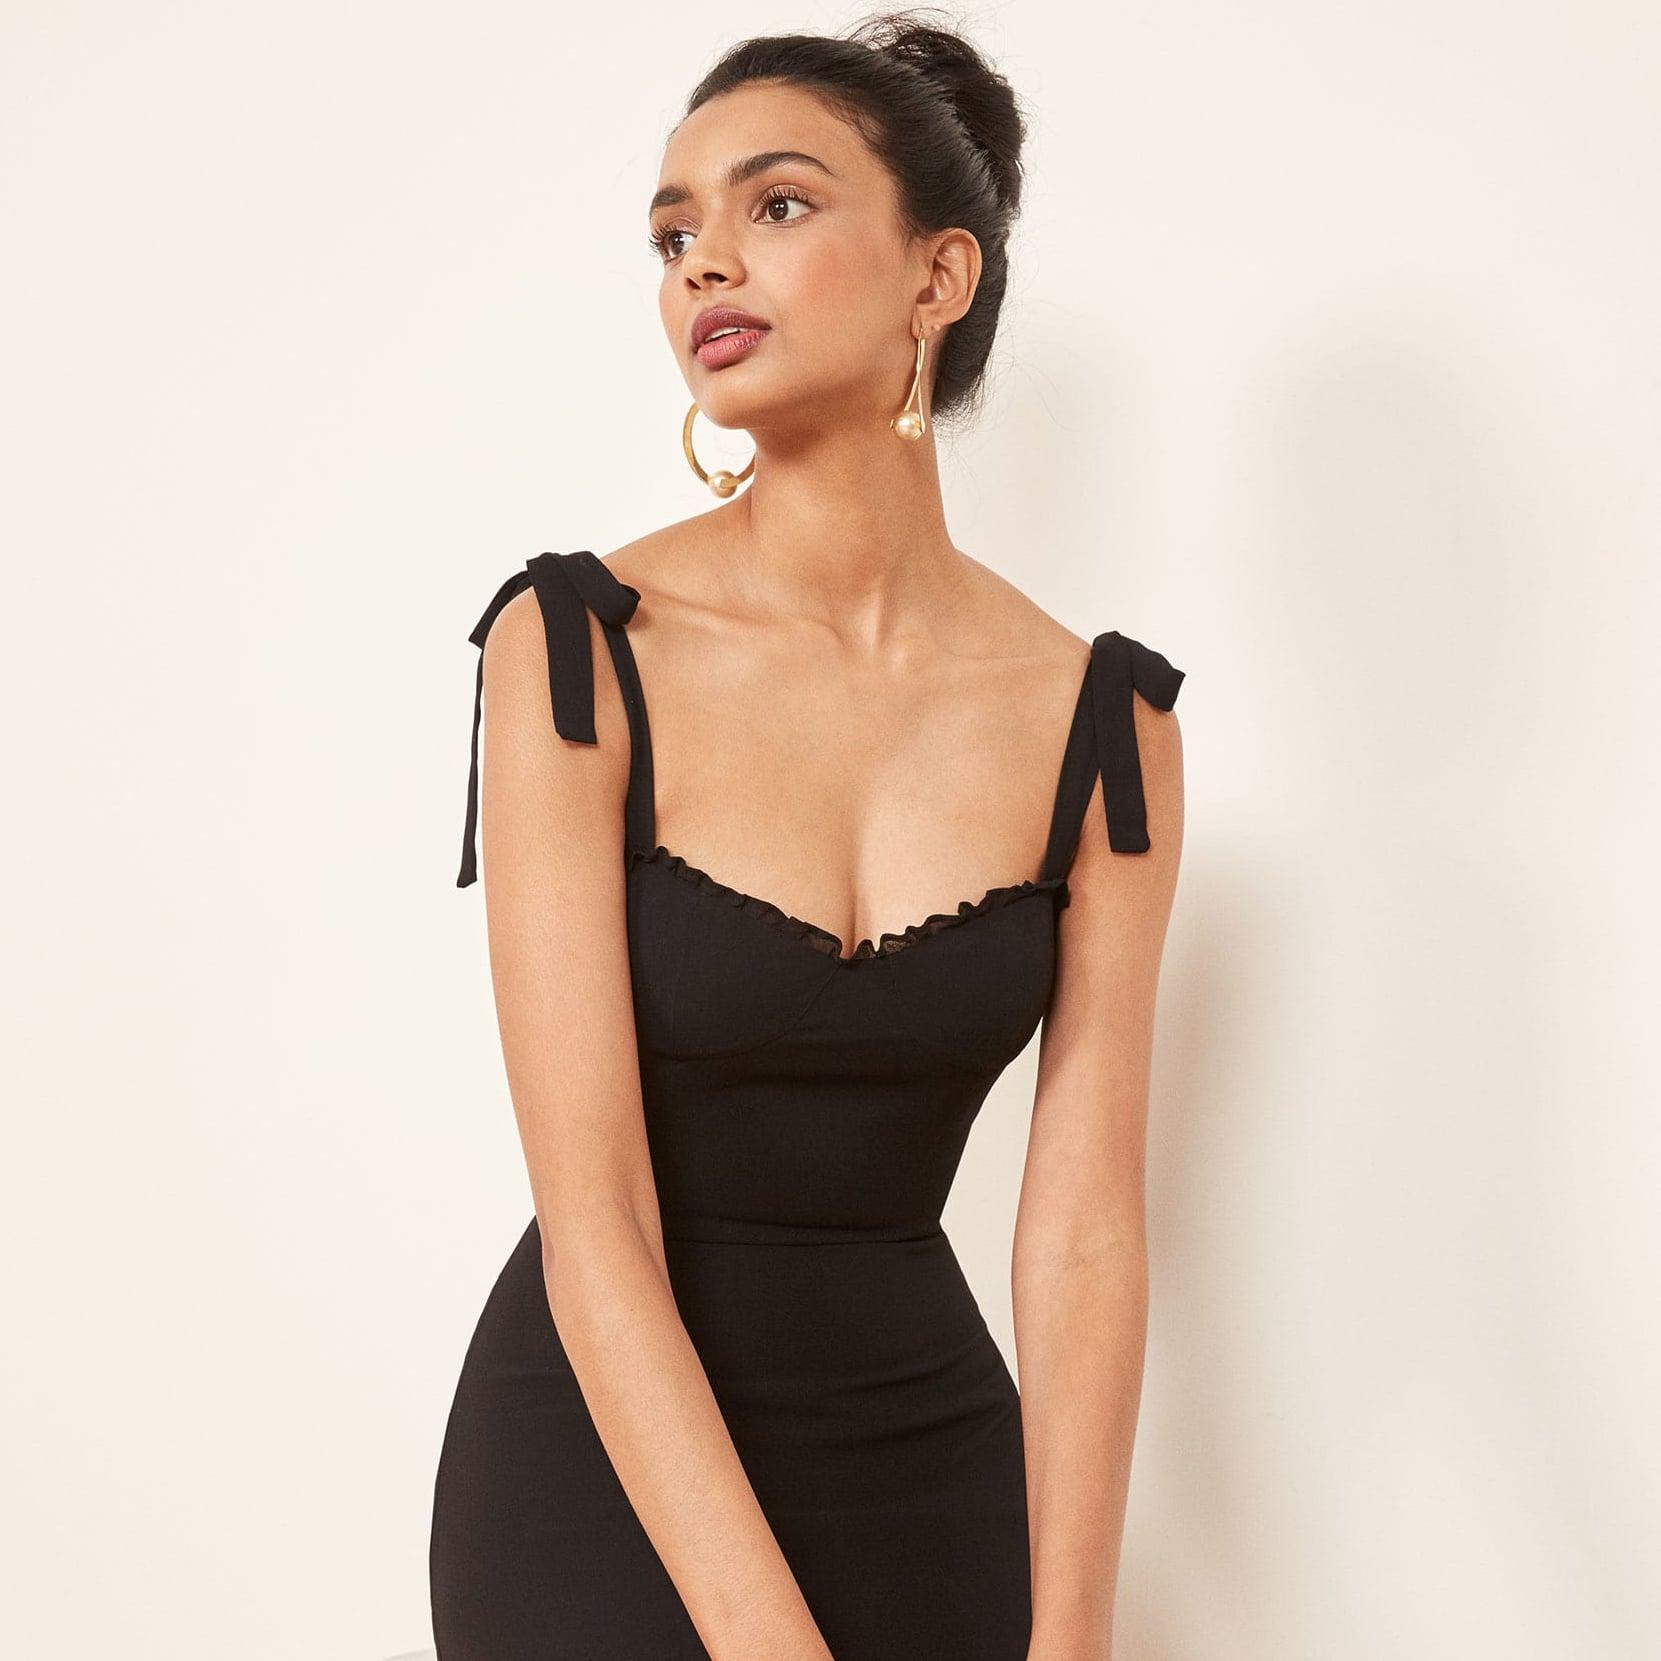 Basic Clothing For Women  POPSUGAR Fashion